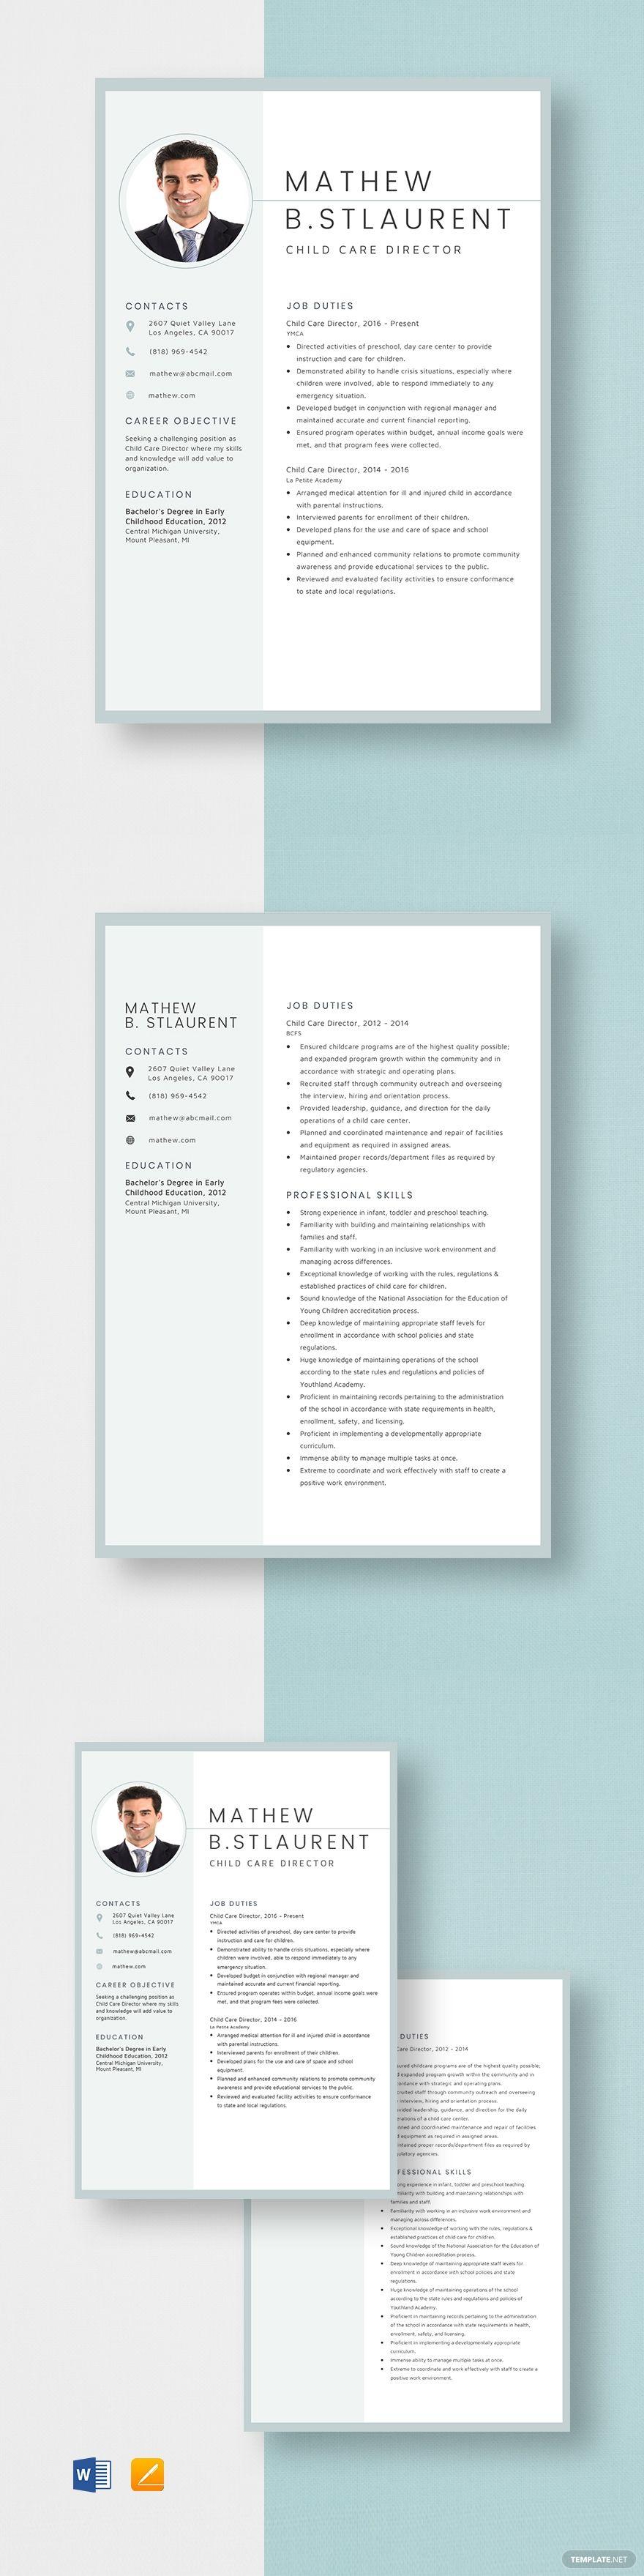 Child care director resume template in 2020 nursing